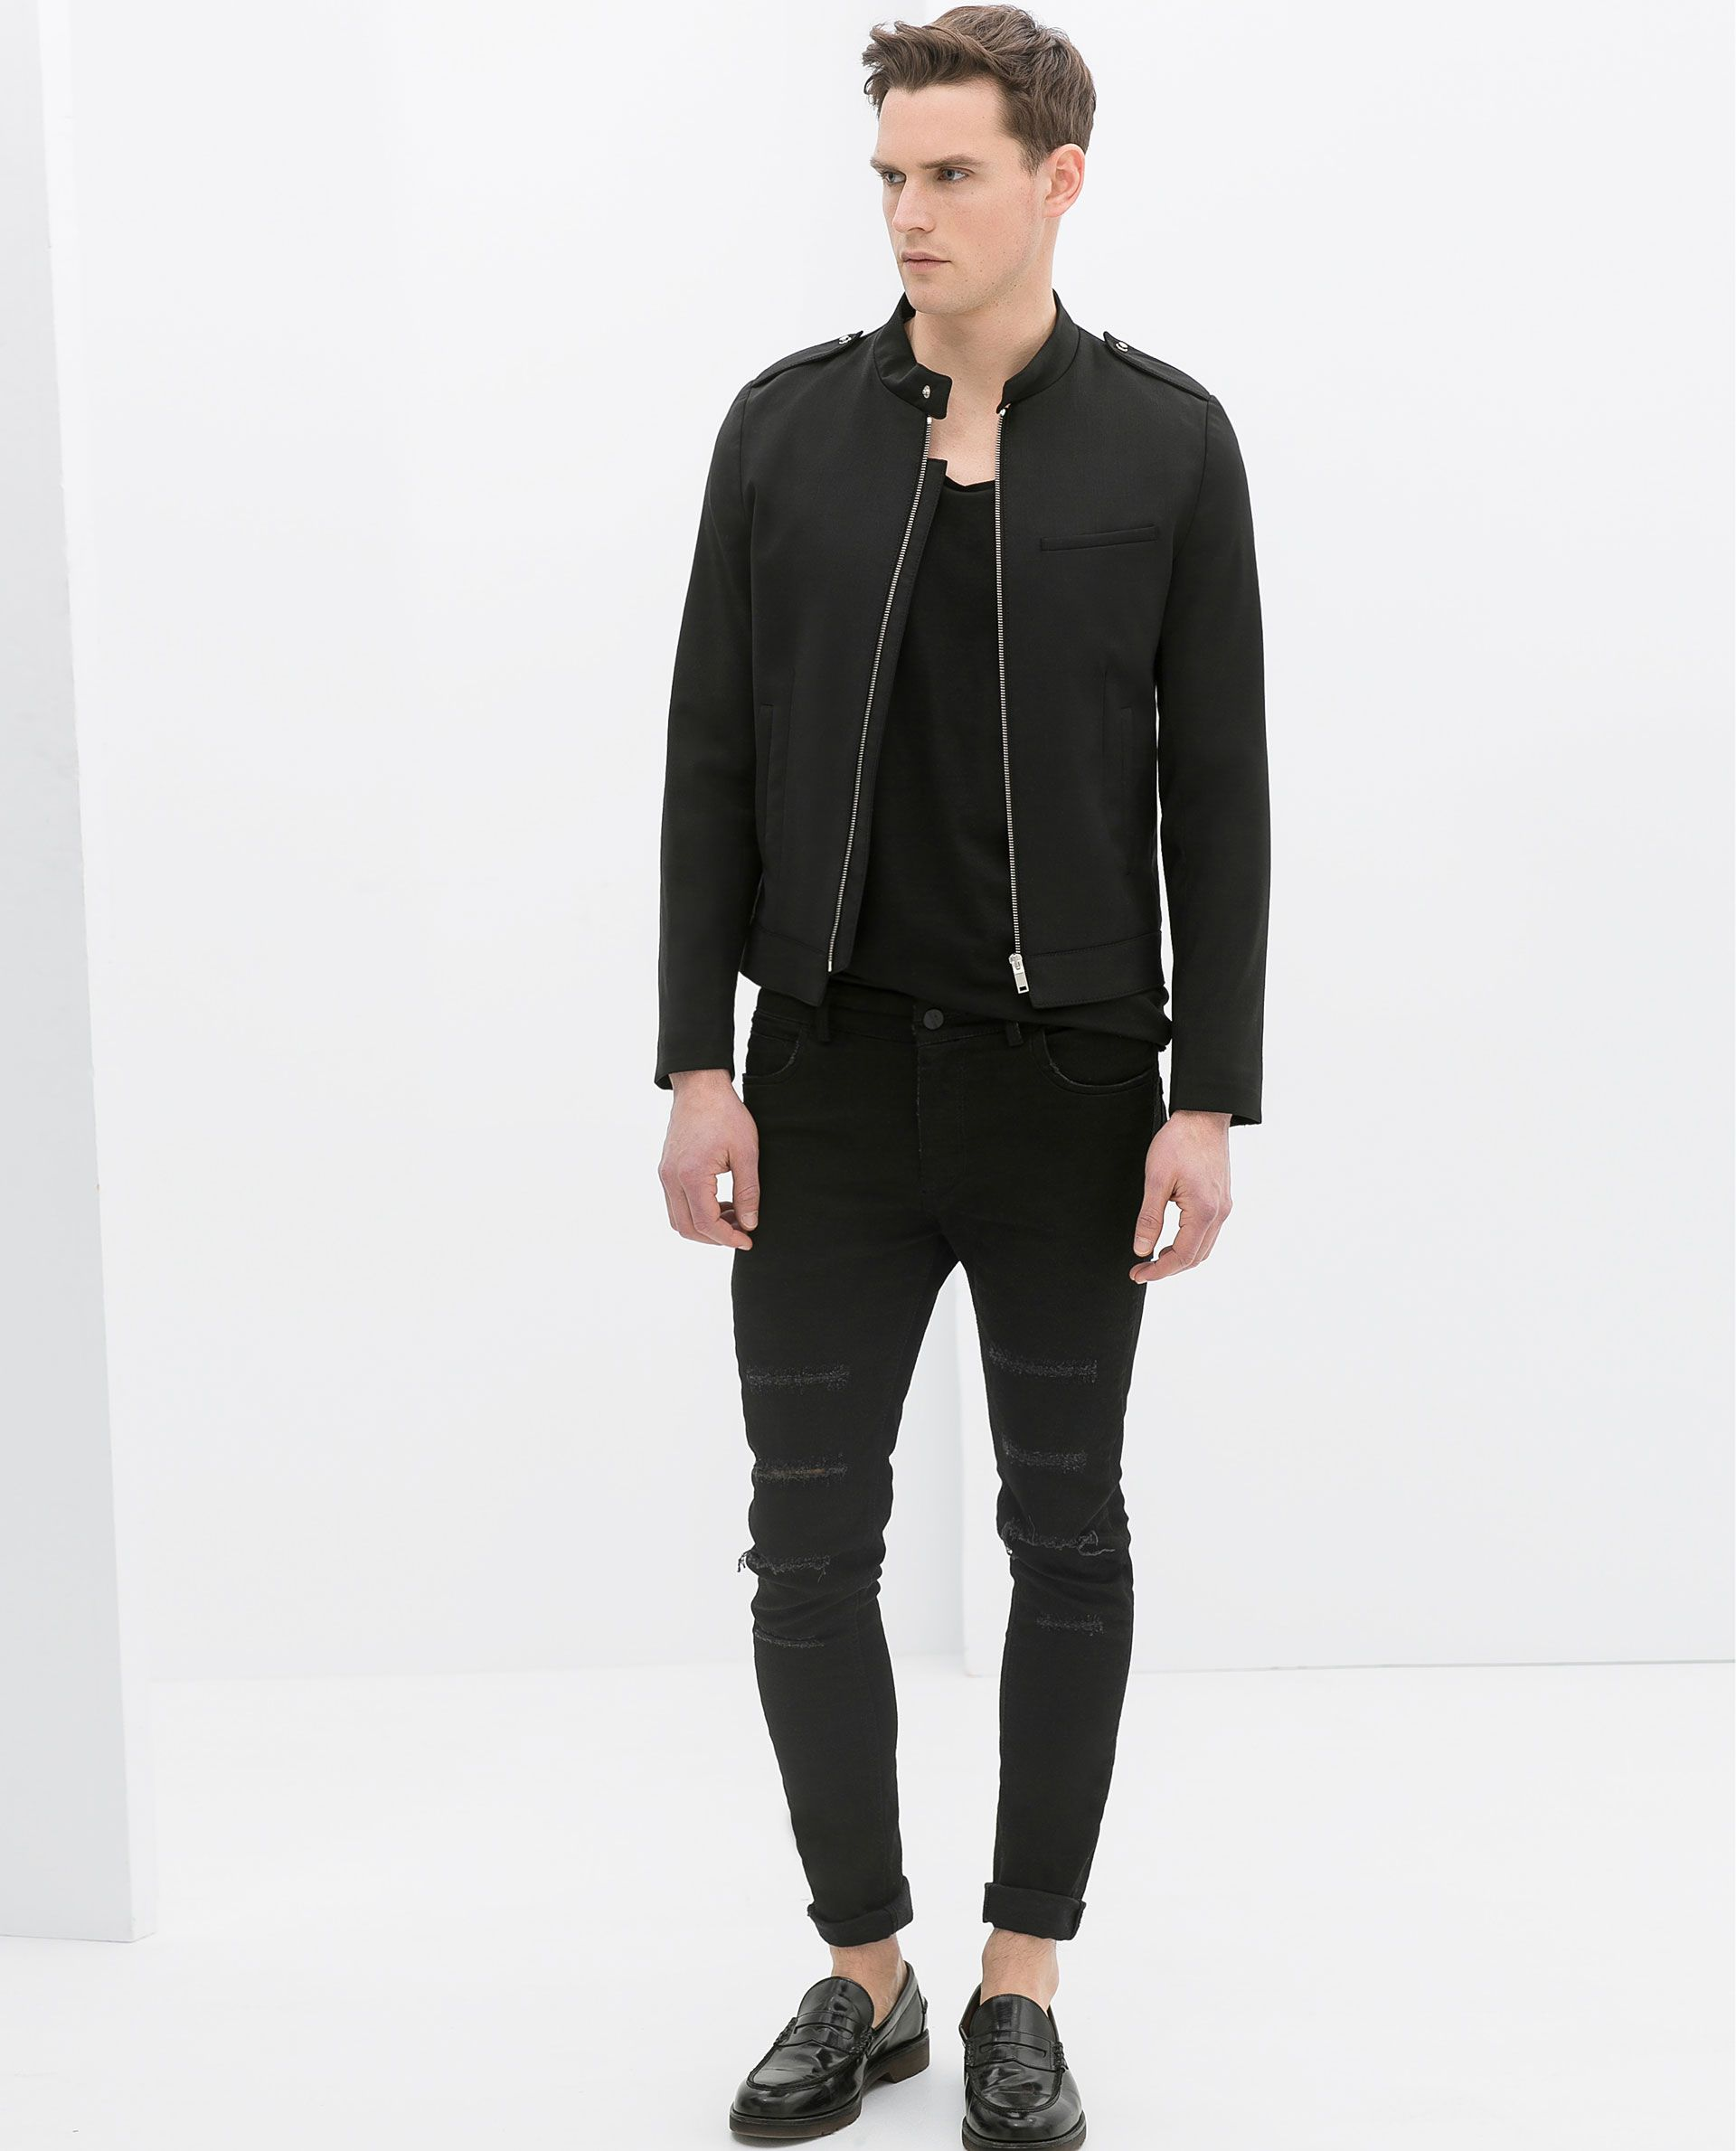 Pin By Leonard Tan On Male Catwalk Zara Man Jacket Mens Fashion Summer Outfits Mens Fashion Business Casual [ 2379 x 1920 Pixel ]